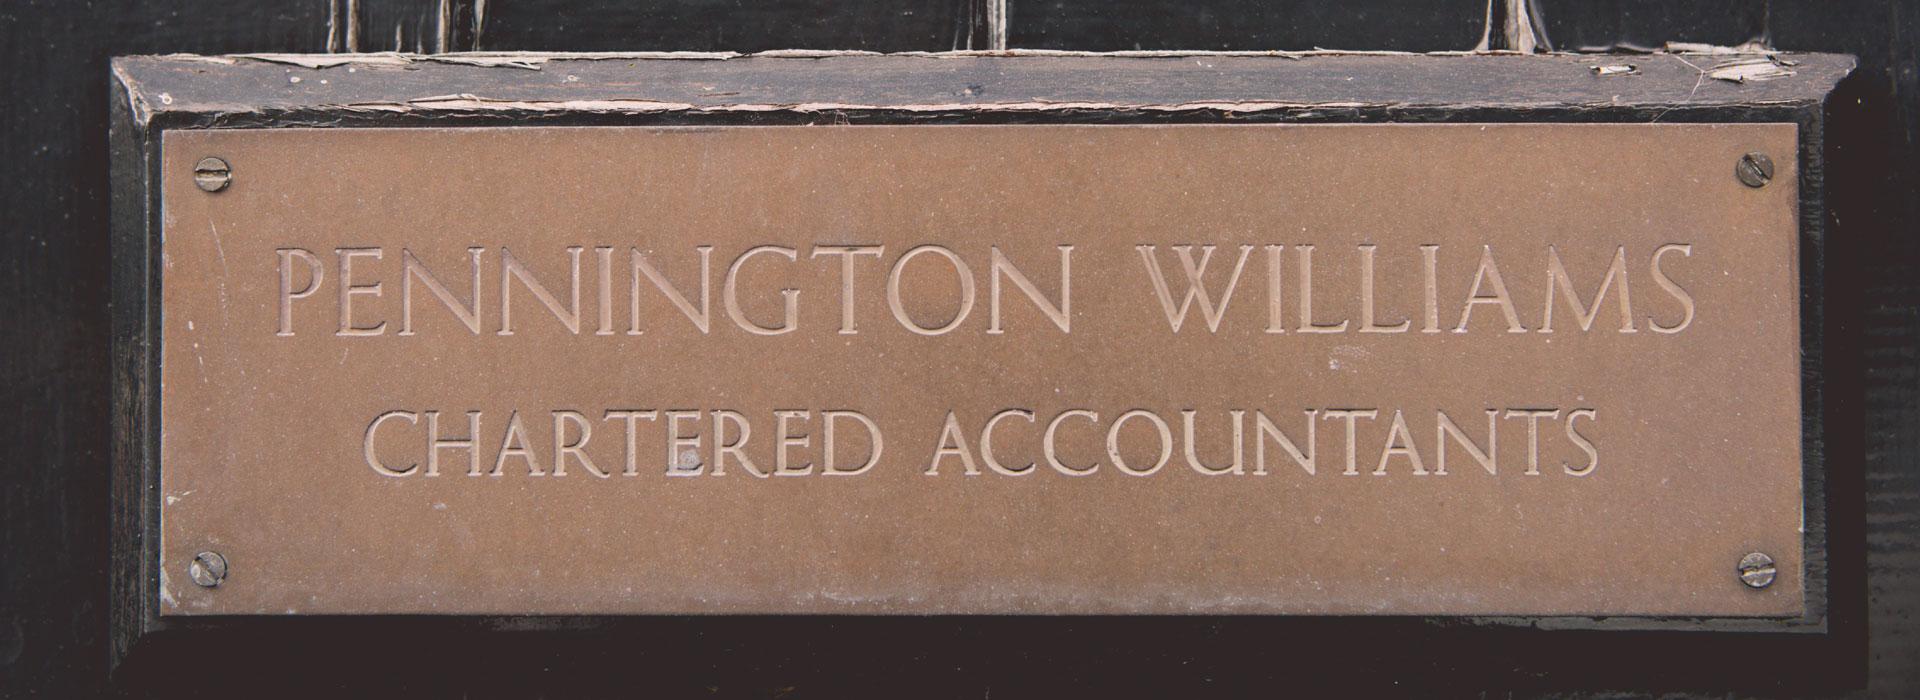 Pennington Williams Brass Plack